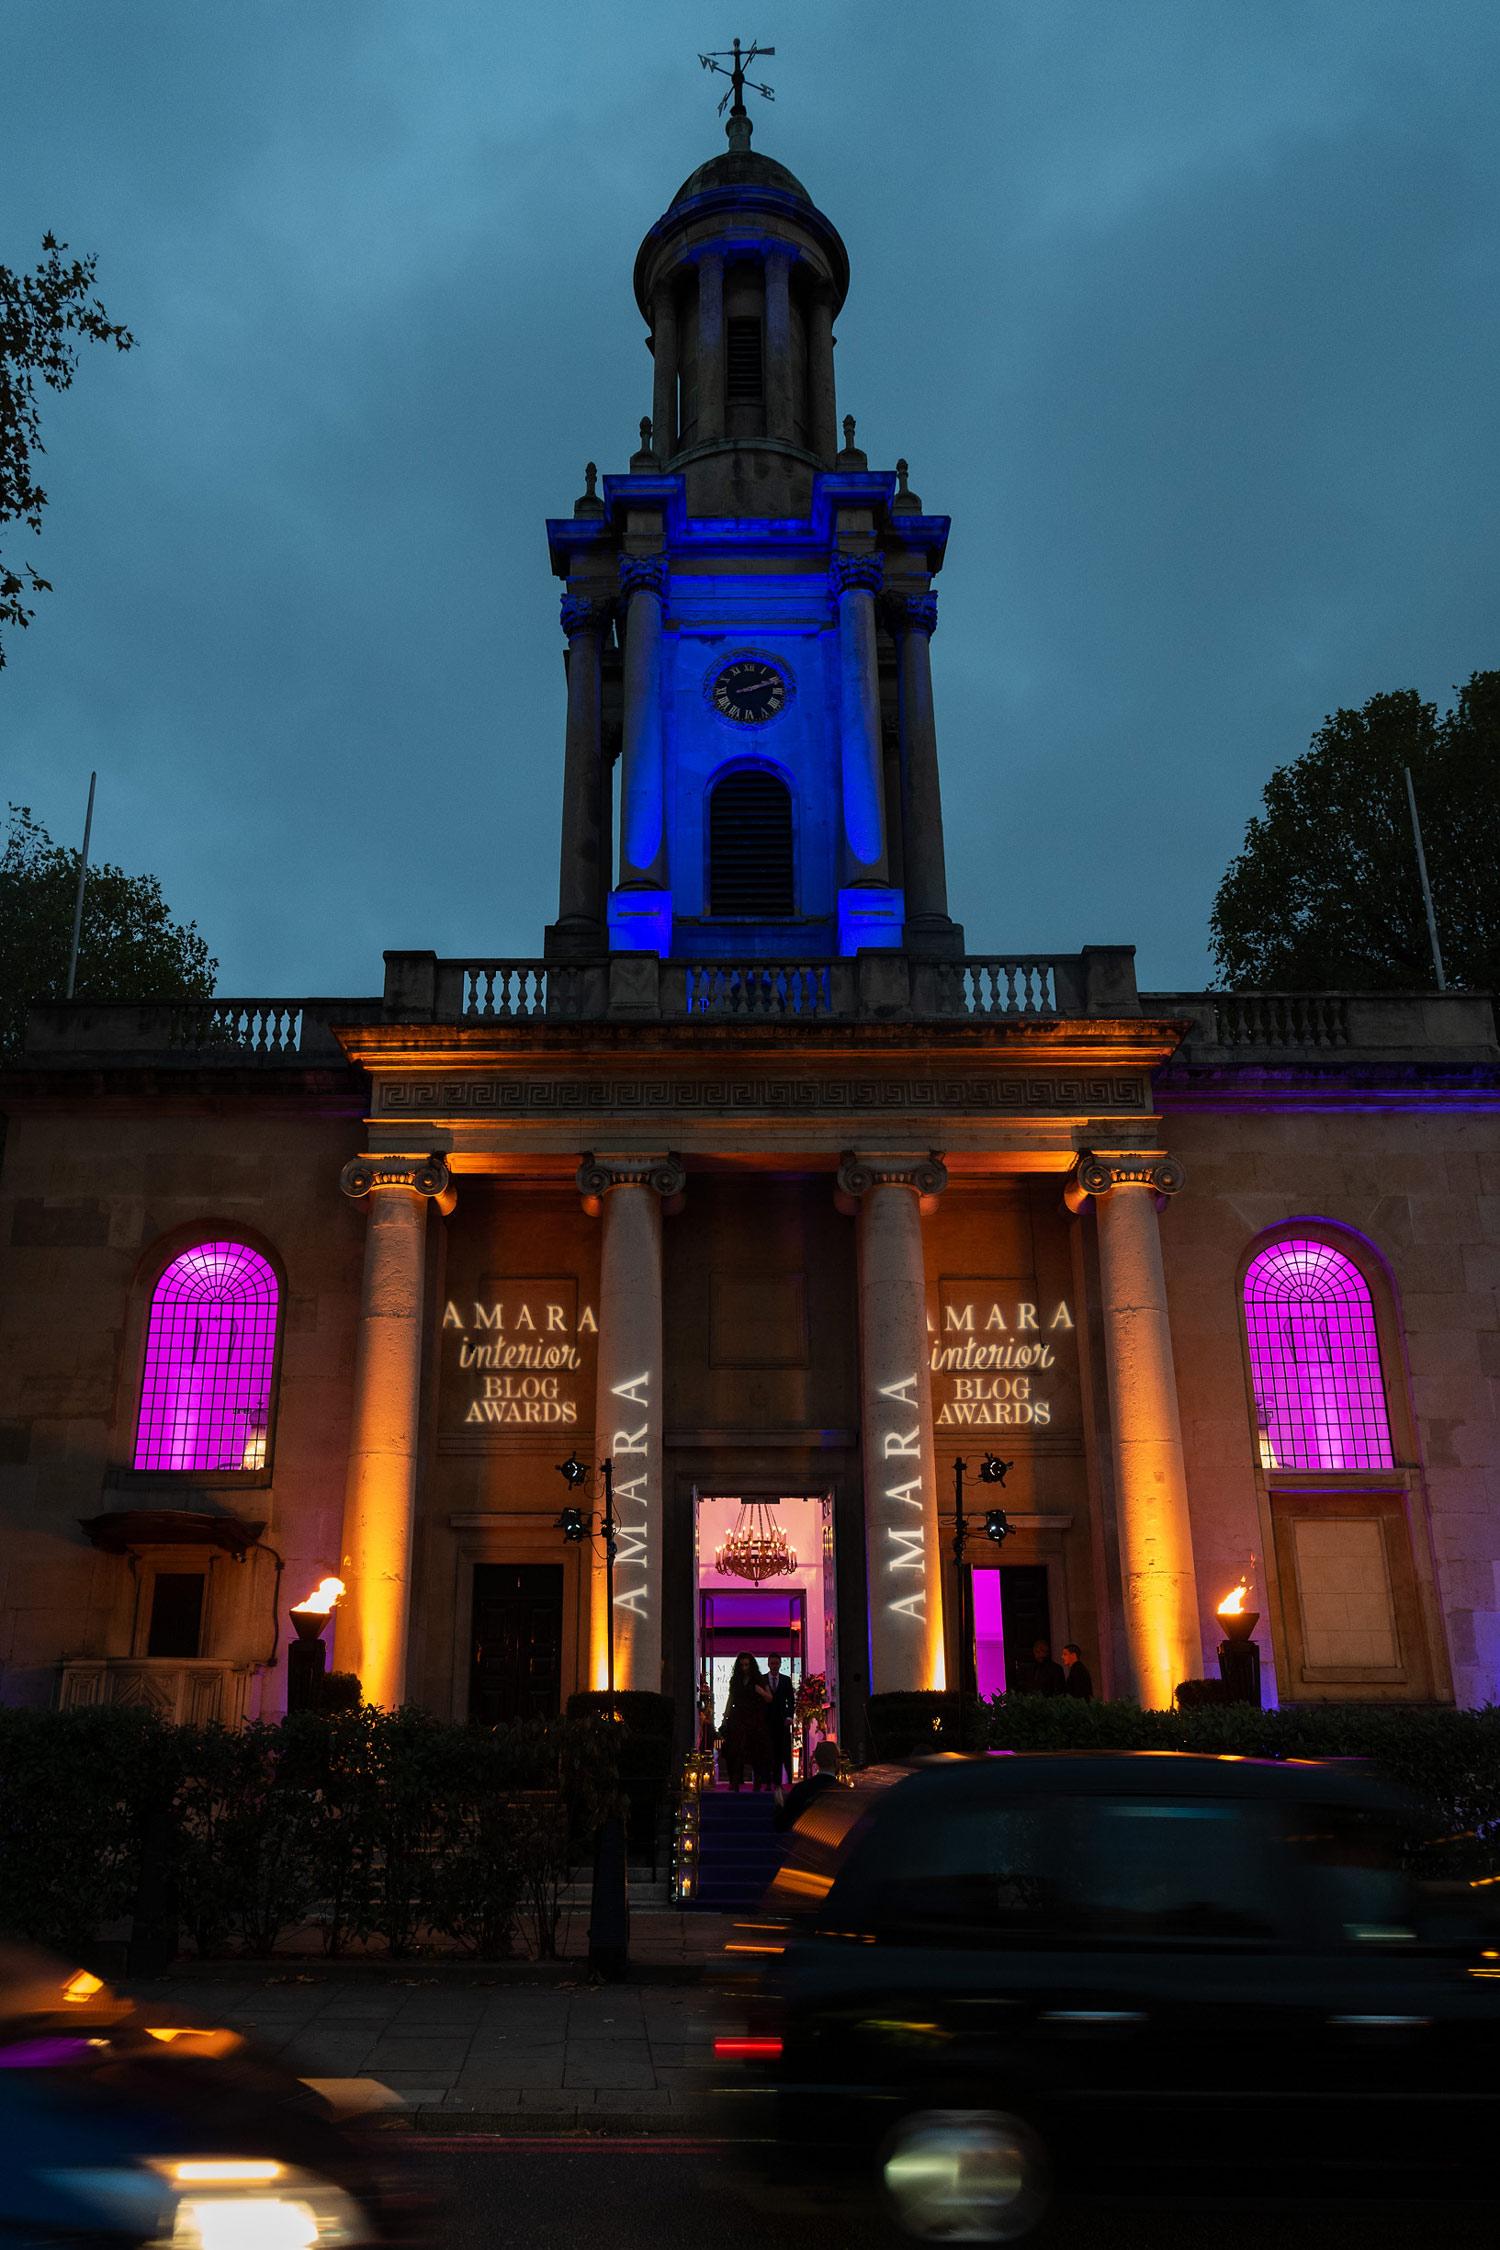 Amara Interior Blog Awards 2018 Night At One Marylebone London - Authentic Interior BLOG www.AuthenticInterior.com